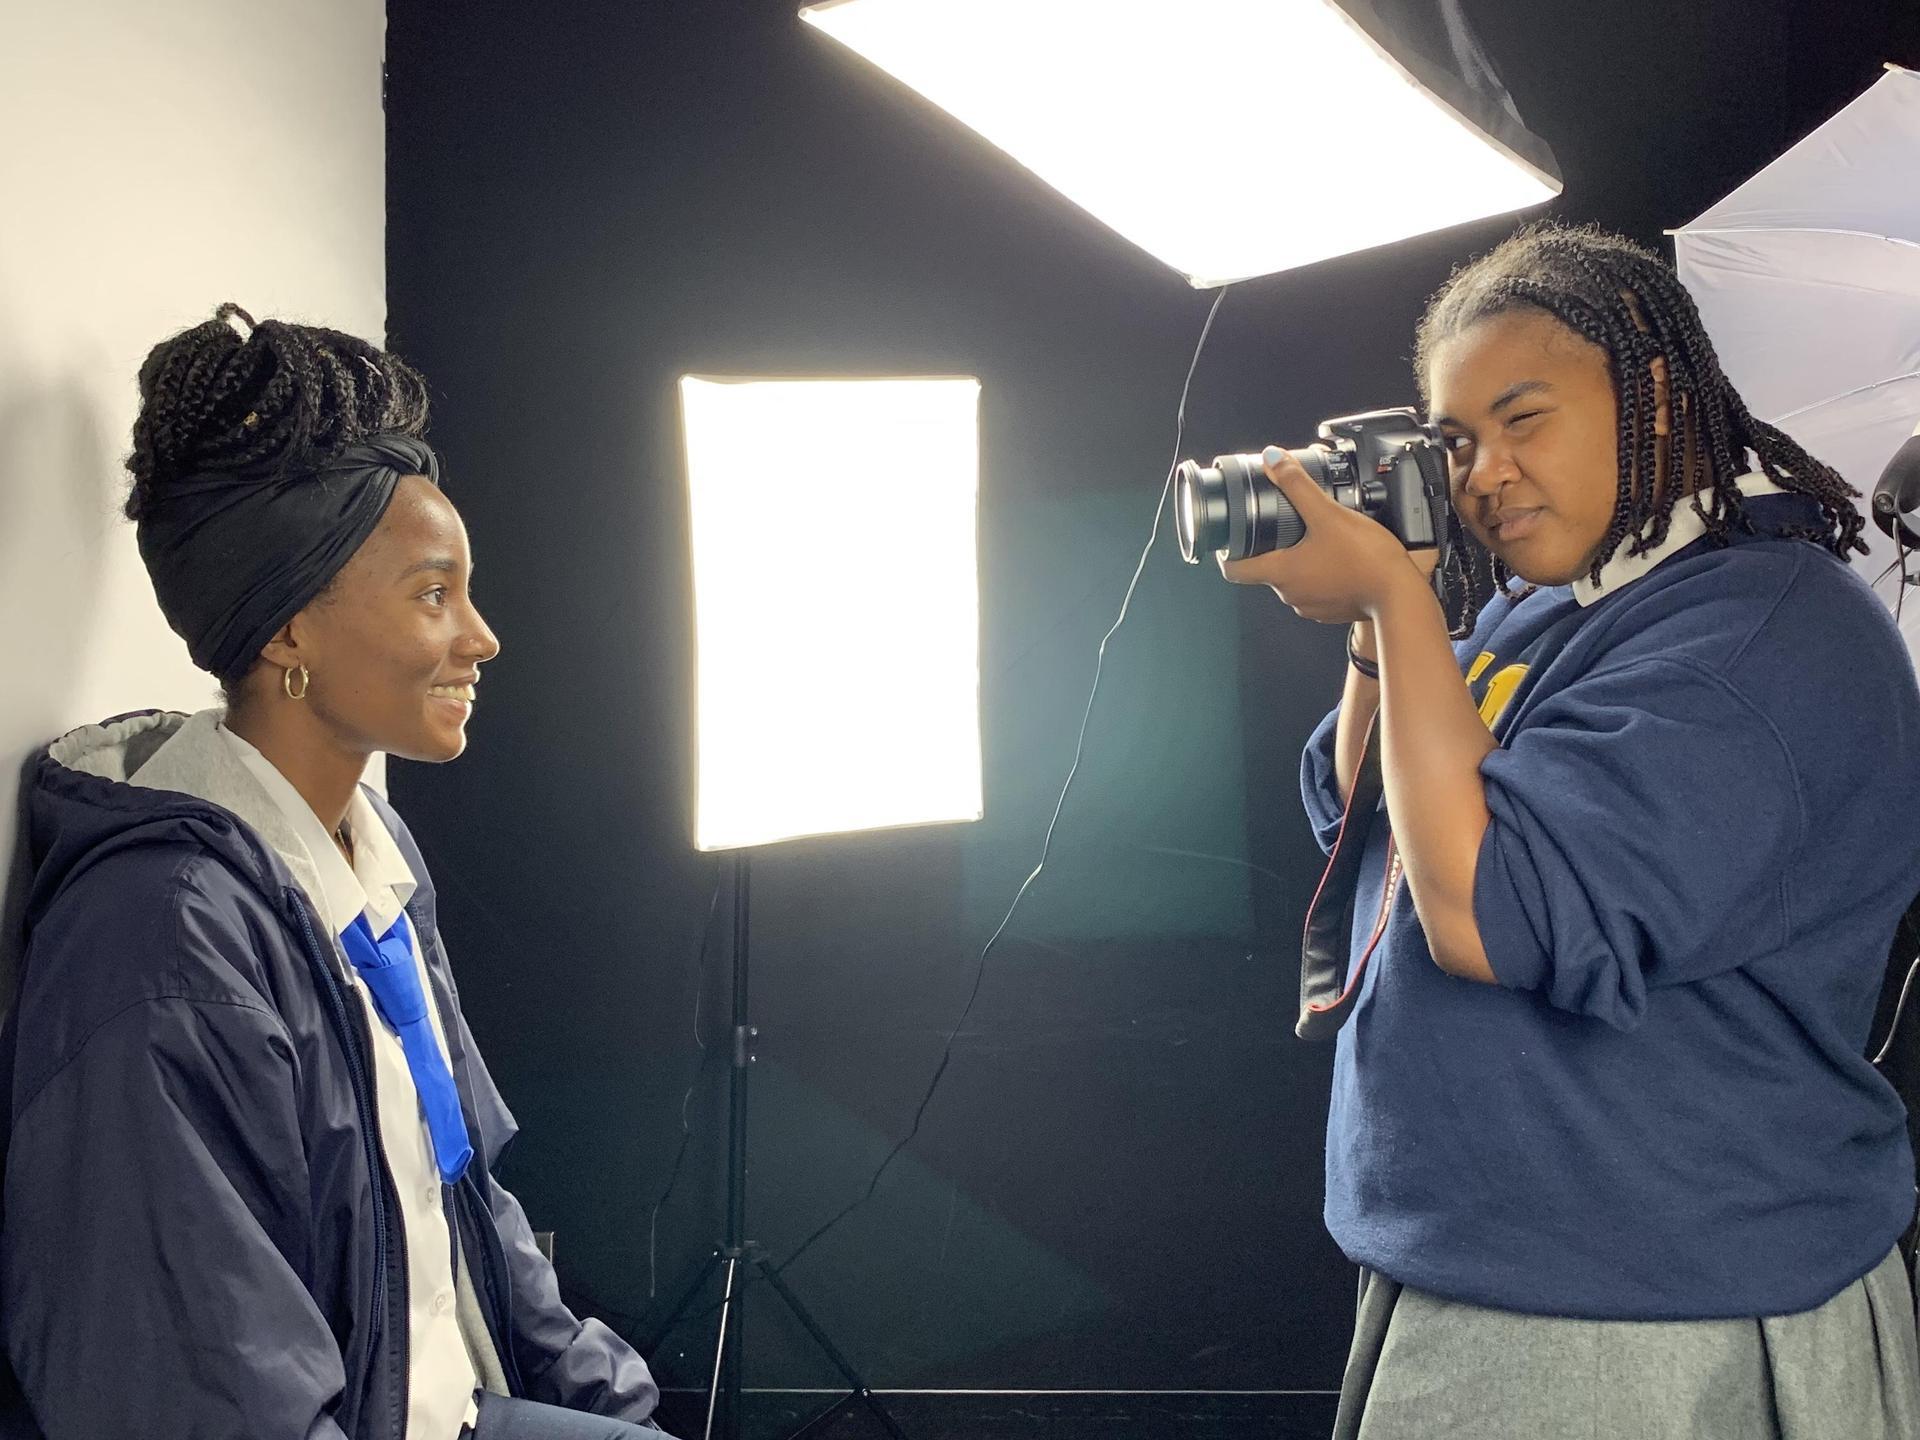 media students